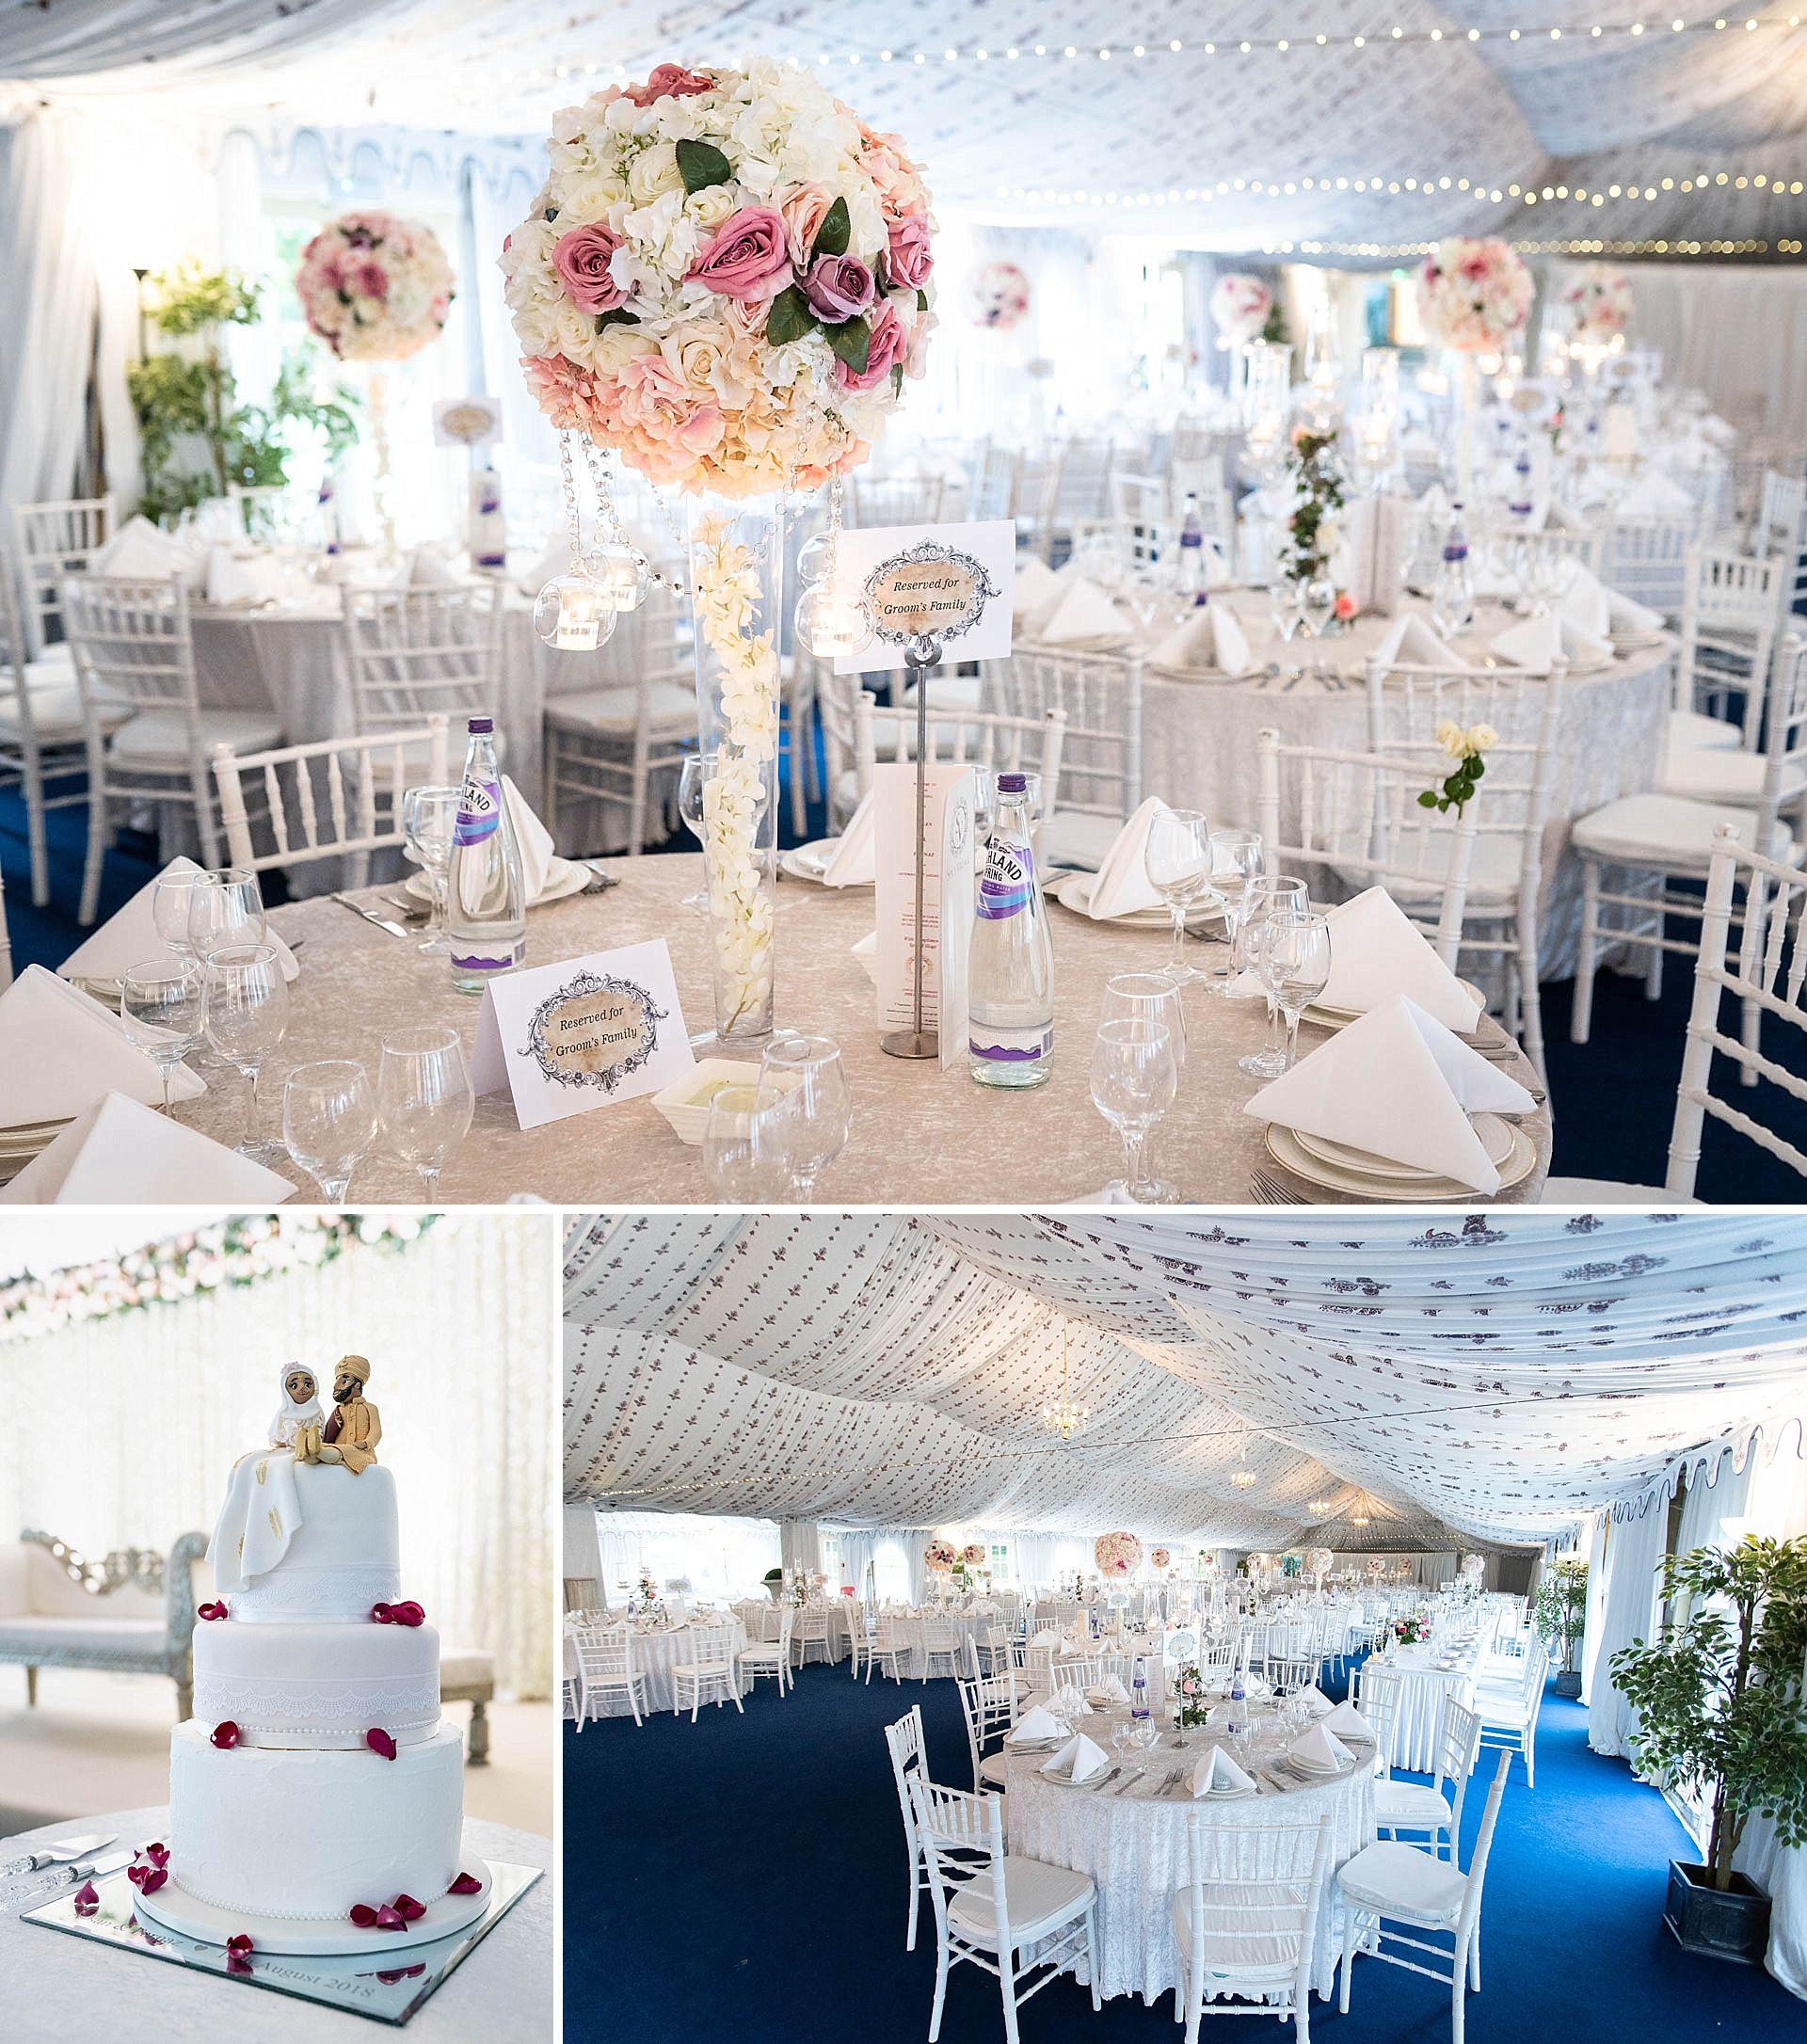 Poundon House wedding venue